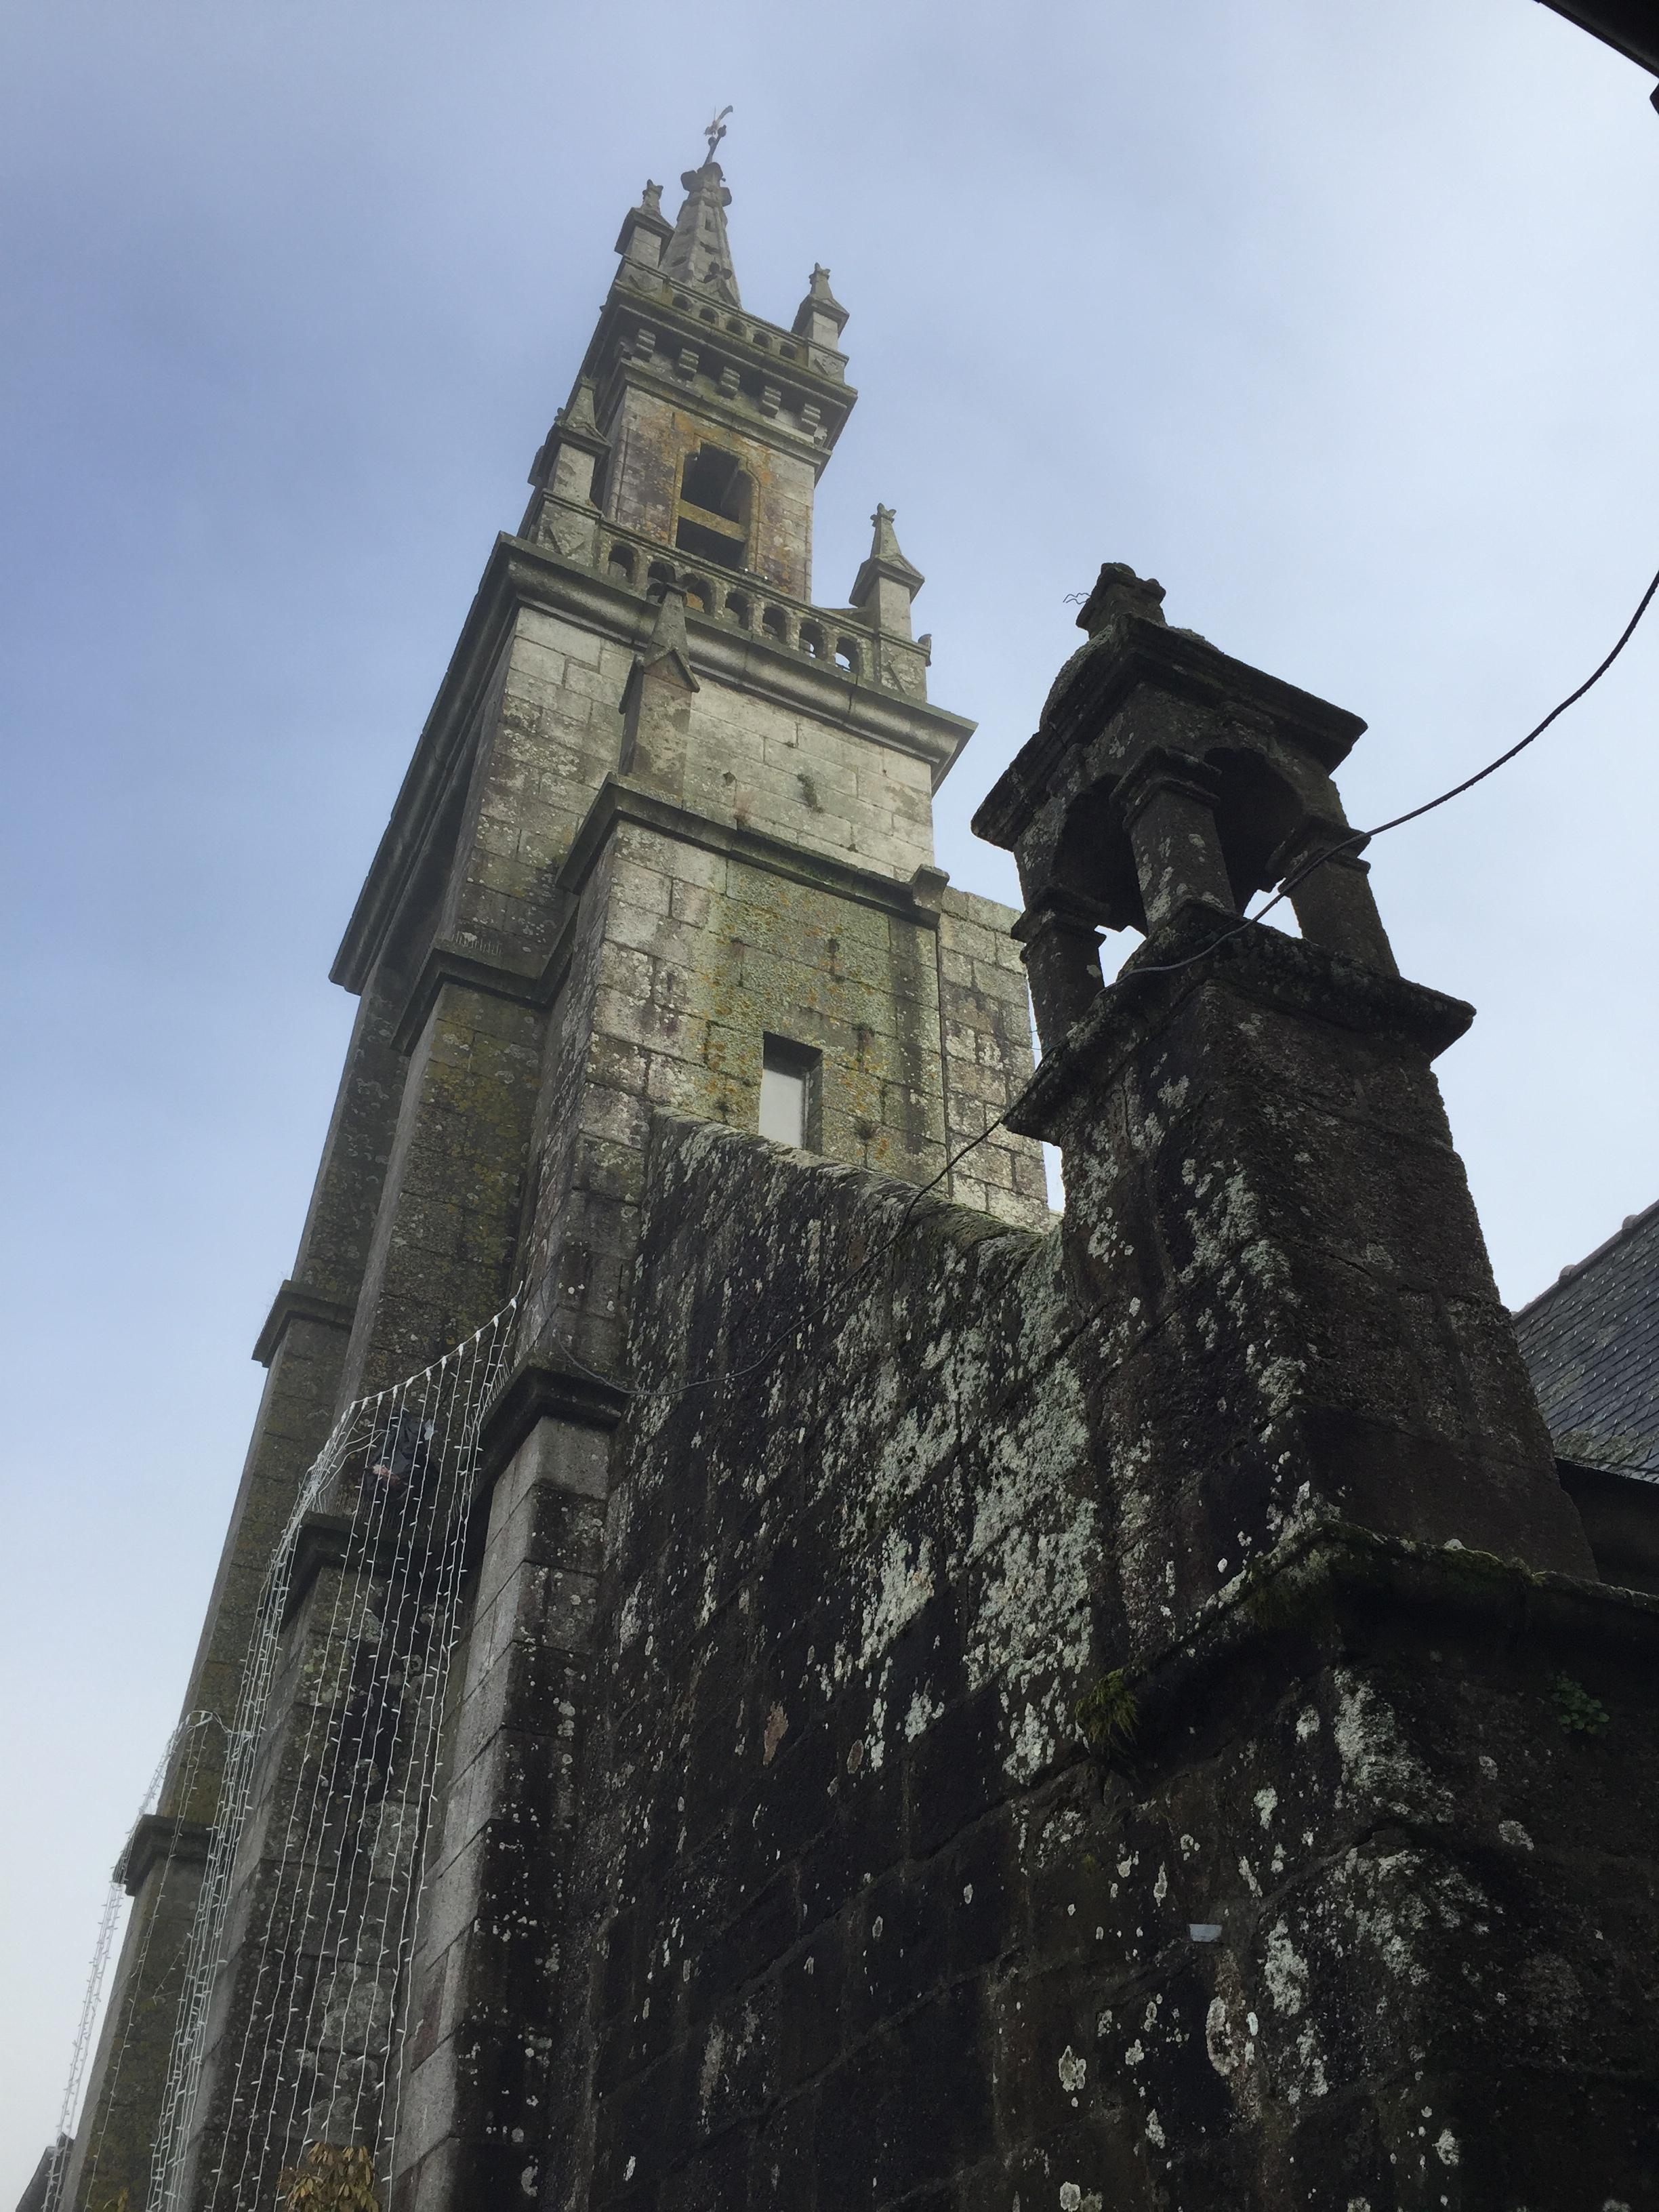 Huelgoat Church, Huelgoat France (Brittany)